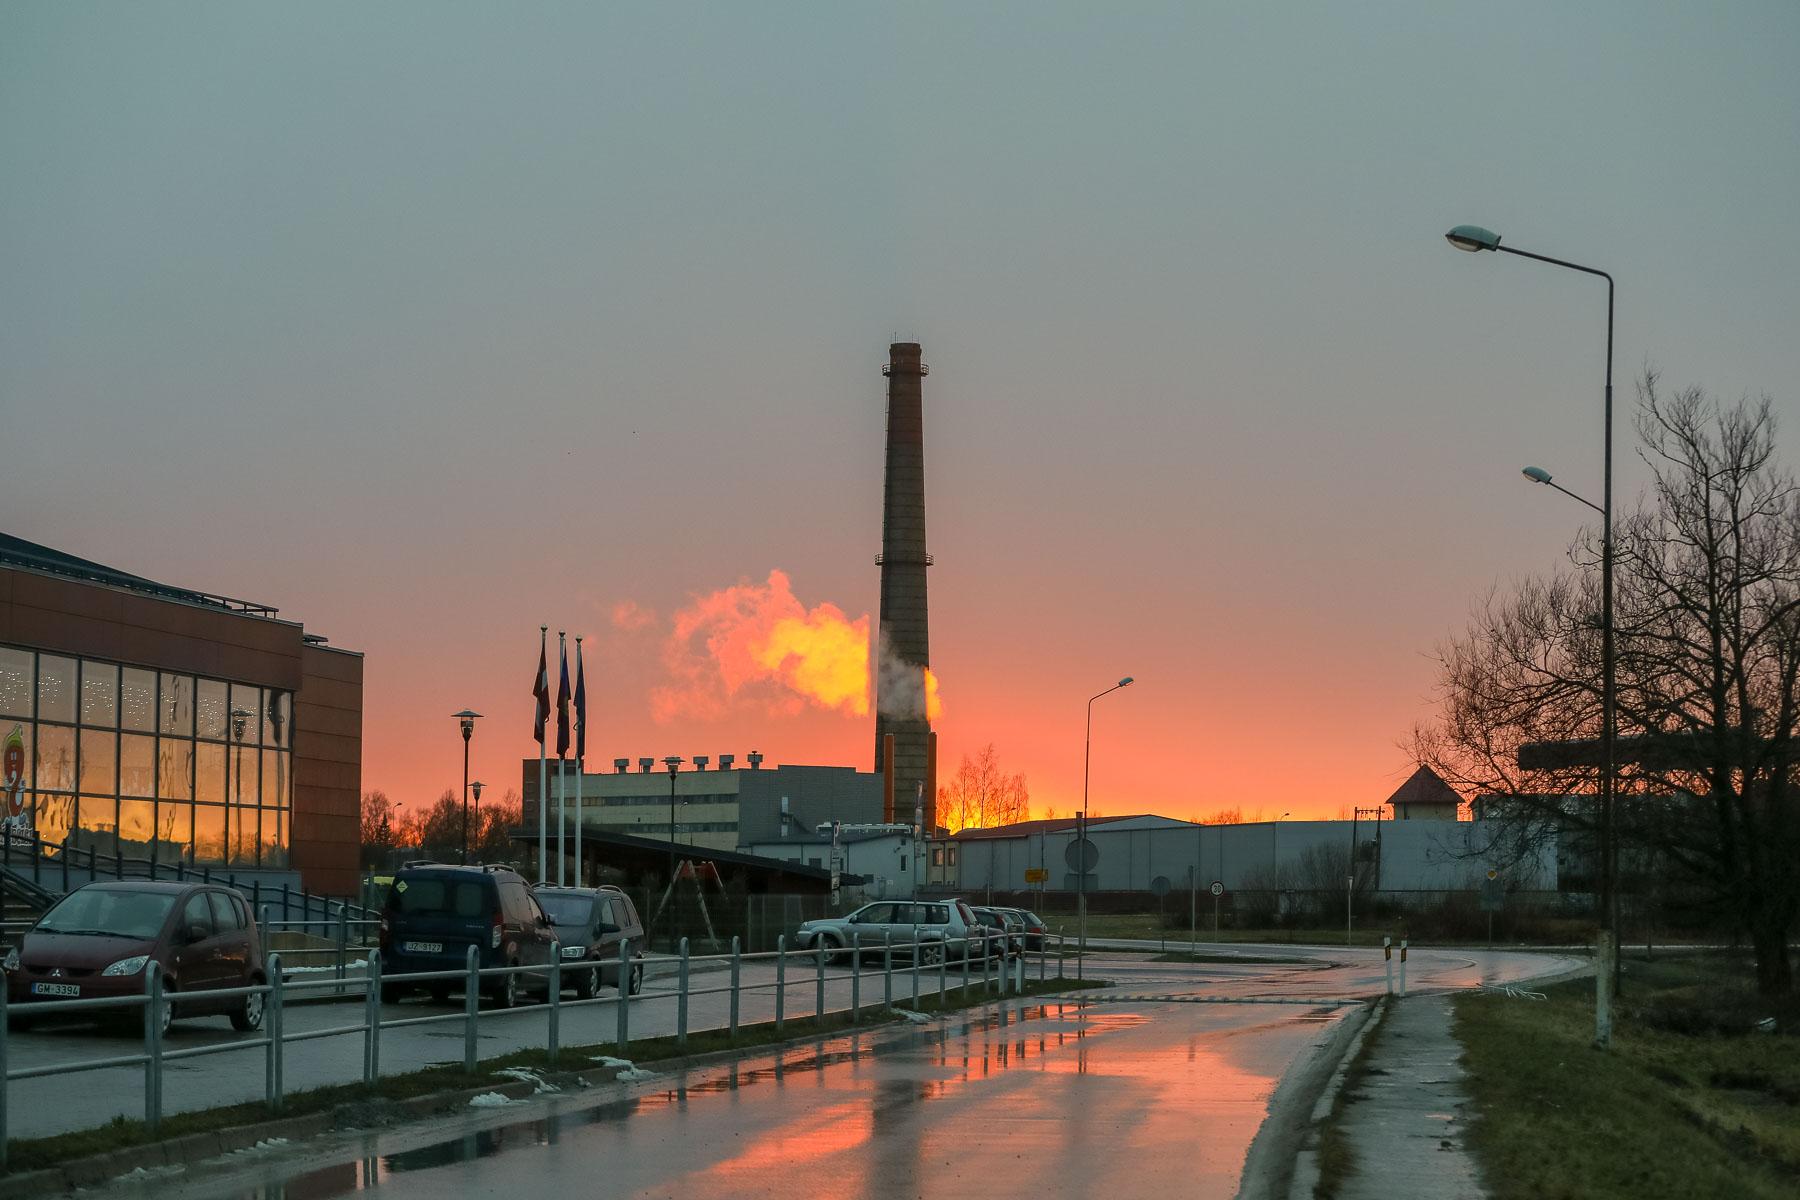 Landscape-cityscape-photography-jelgava-latvia-blocs-blocks-flat-post-soviet--Советские-квартиры-спальный-район-Латвия-город-фотограф-natalia-smith-photography-0092.jpg